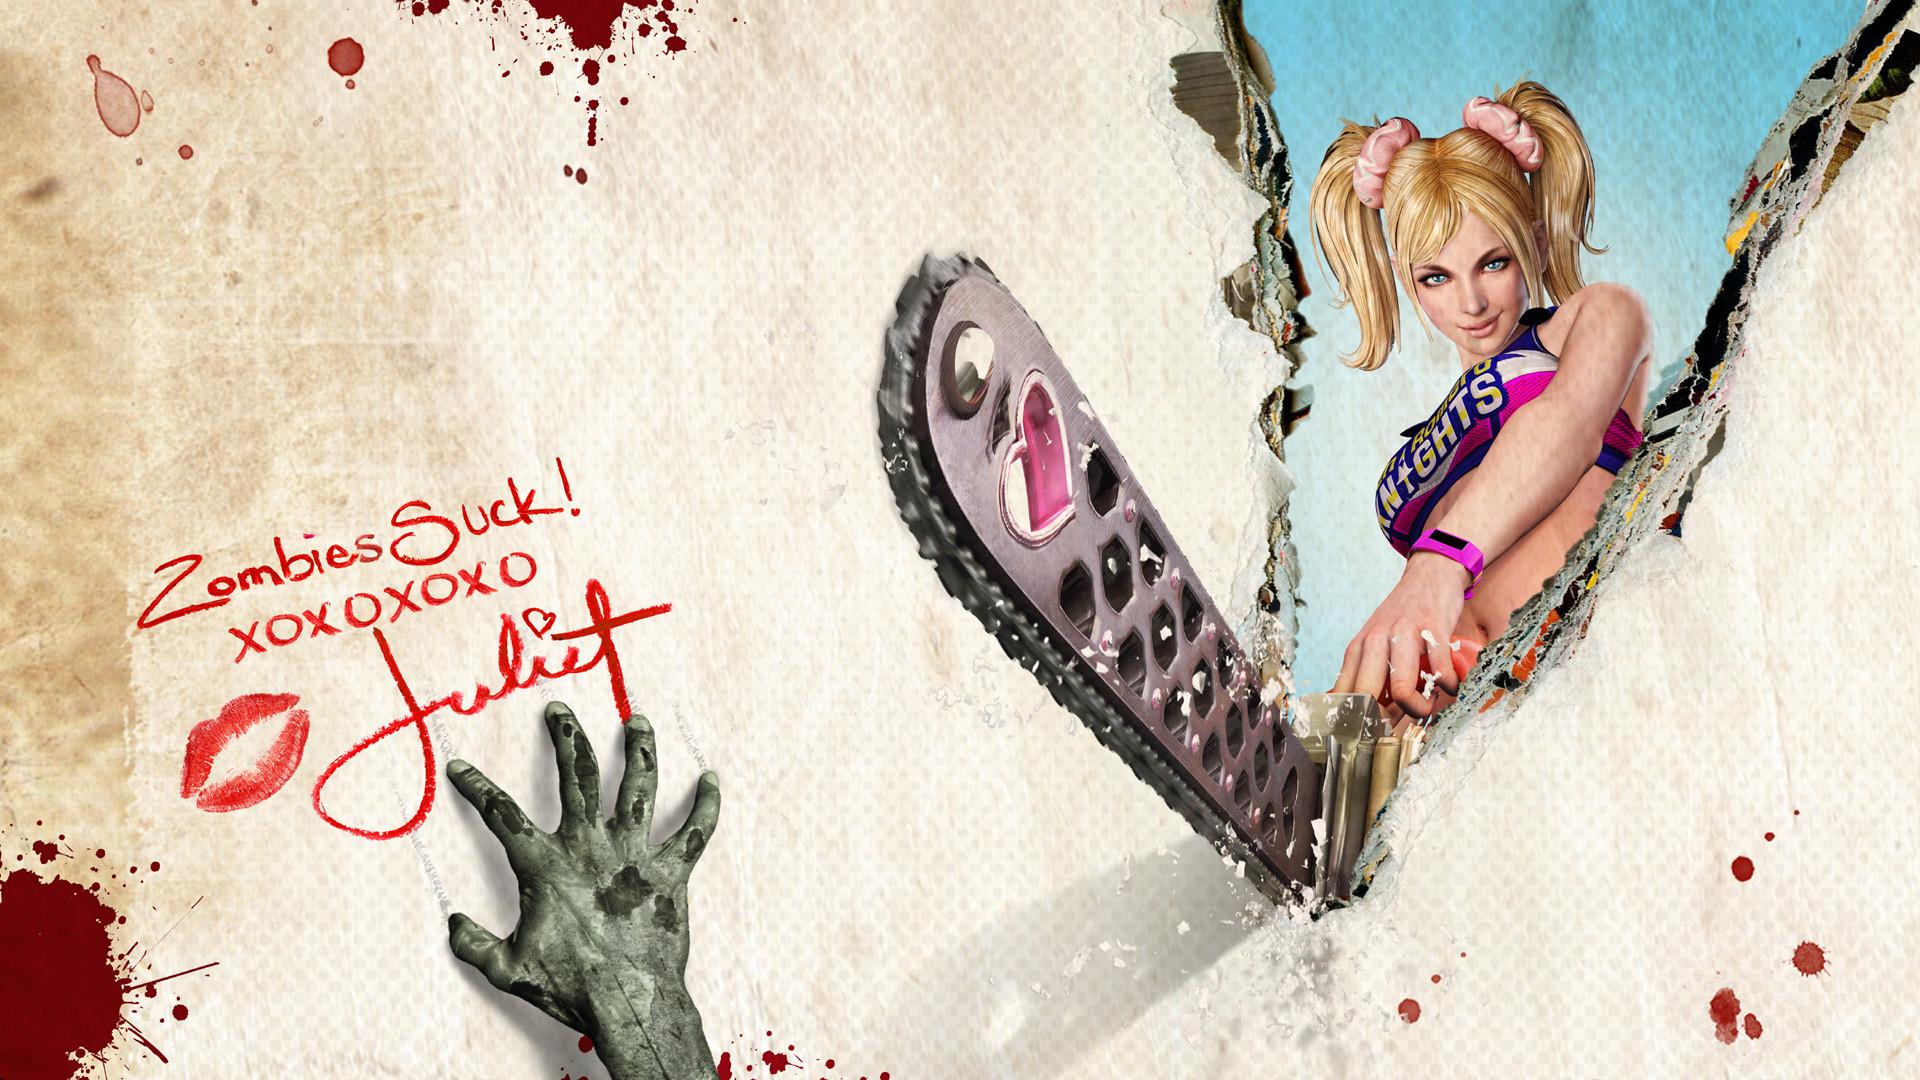 Lollipop Chainsaw Hack and Slash